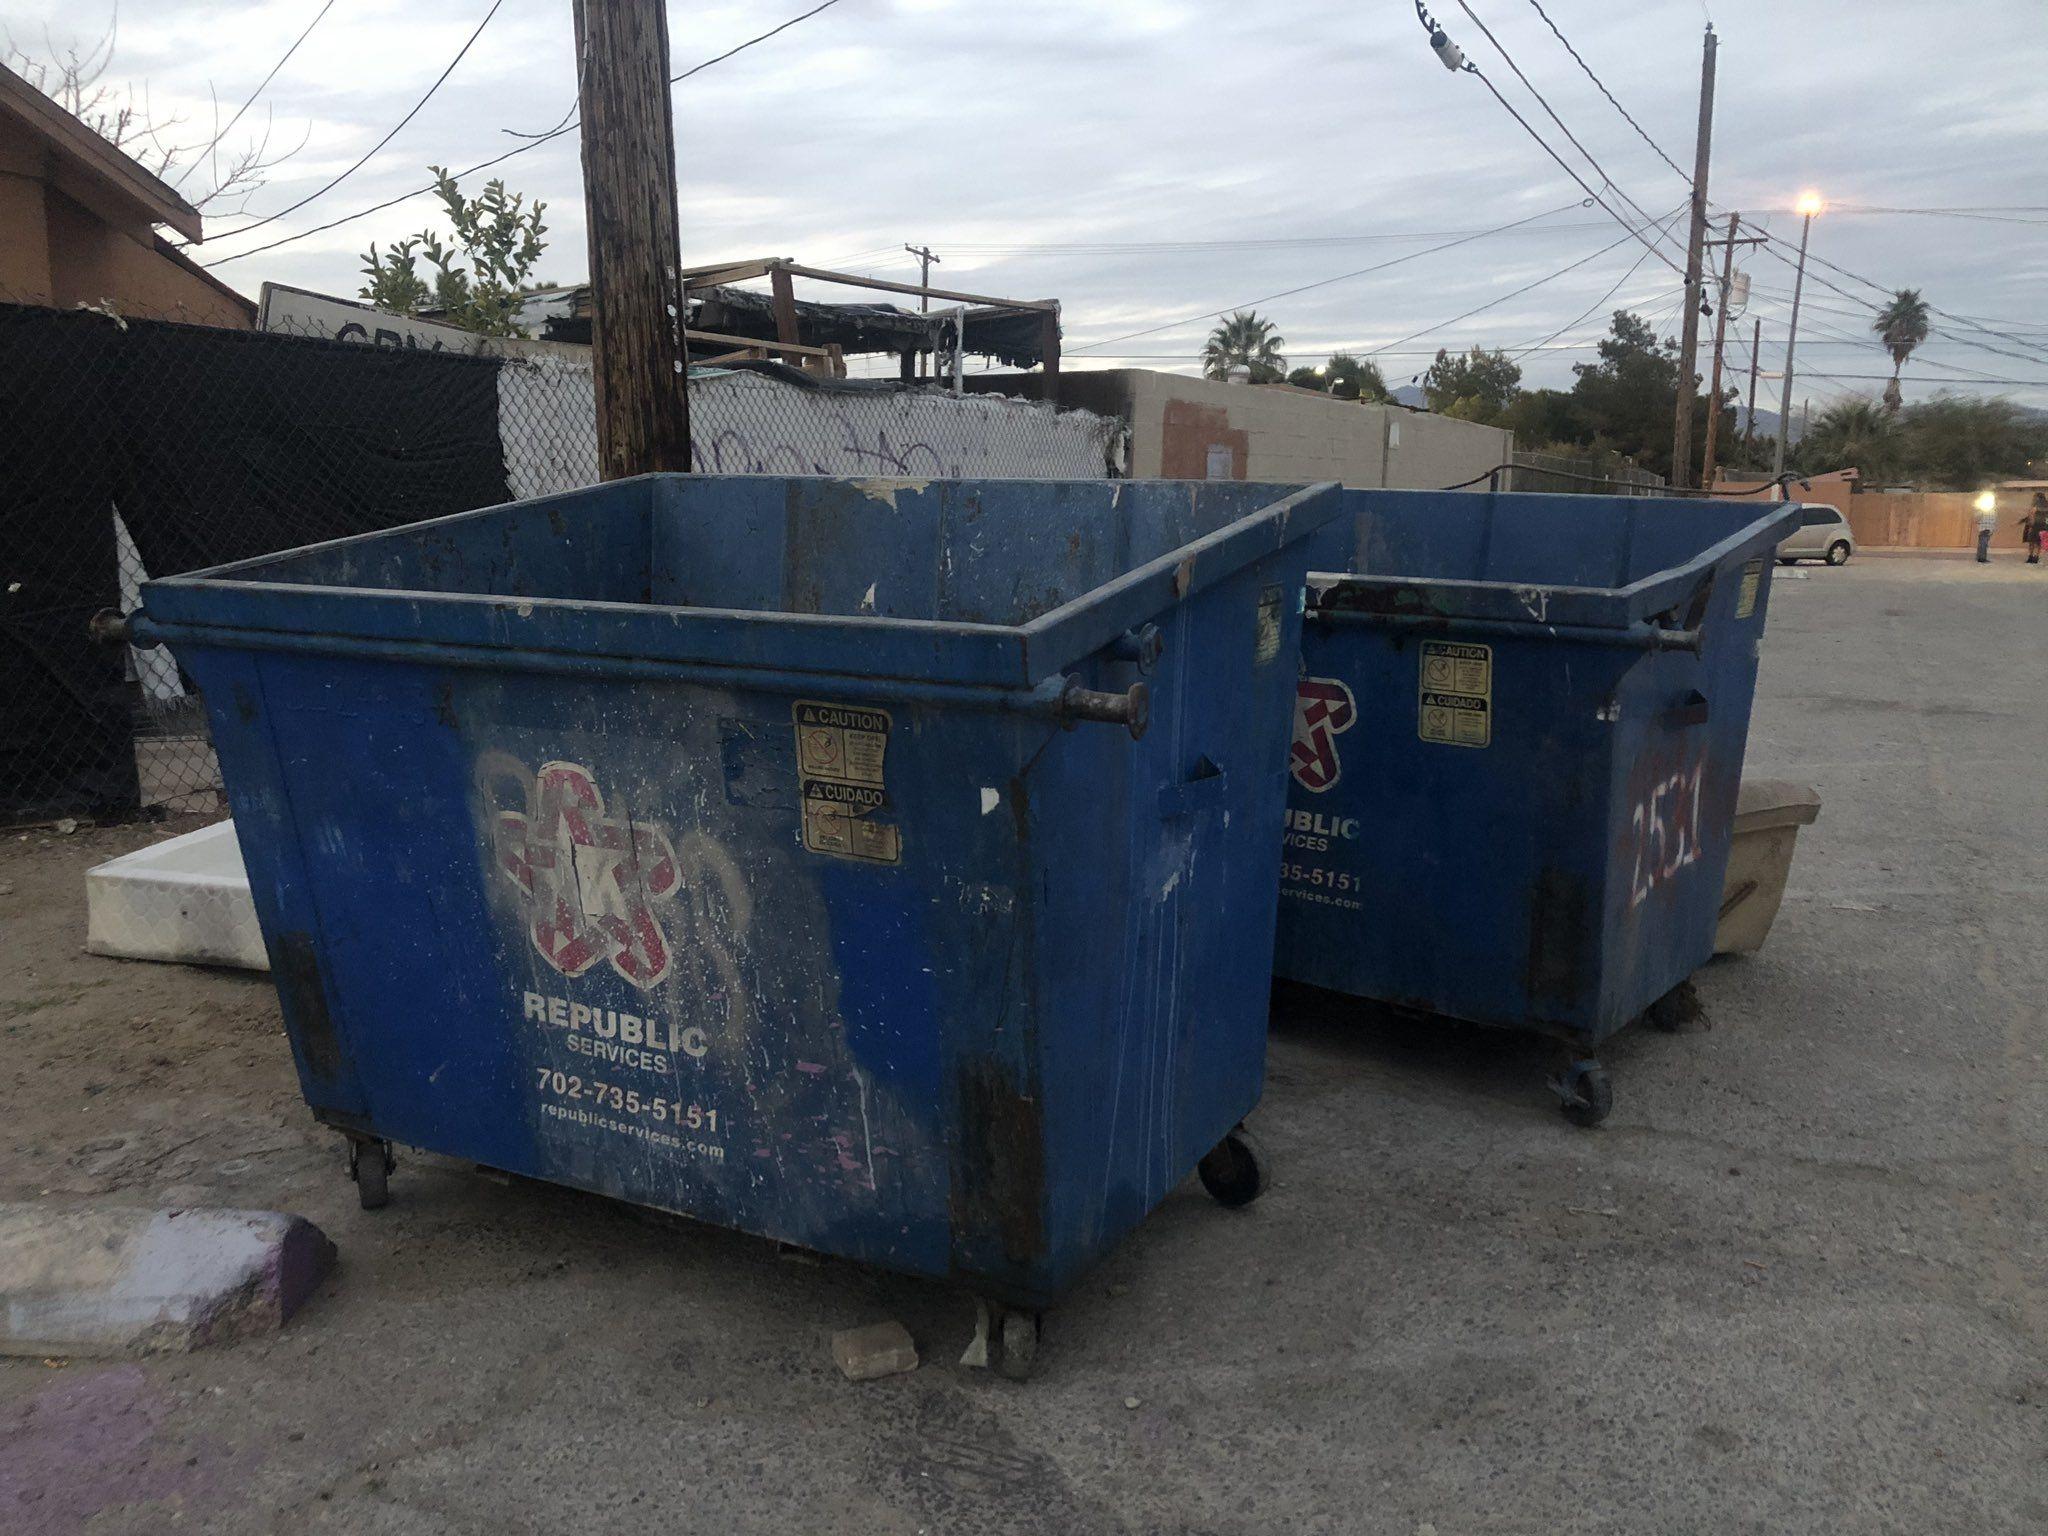 Police: Baby Boy Found Dead Inside Dumpster In Nevada